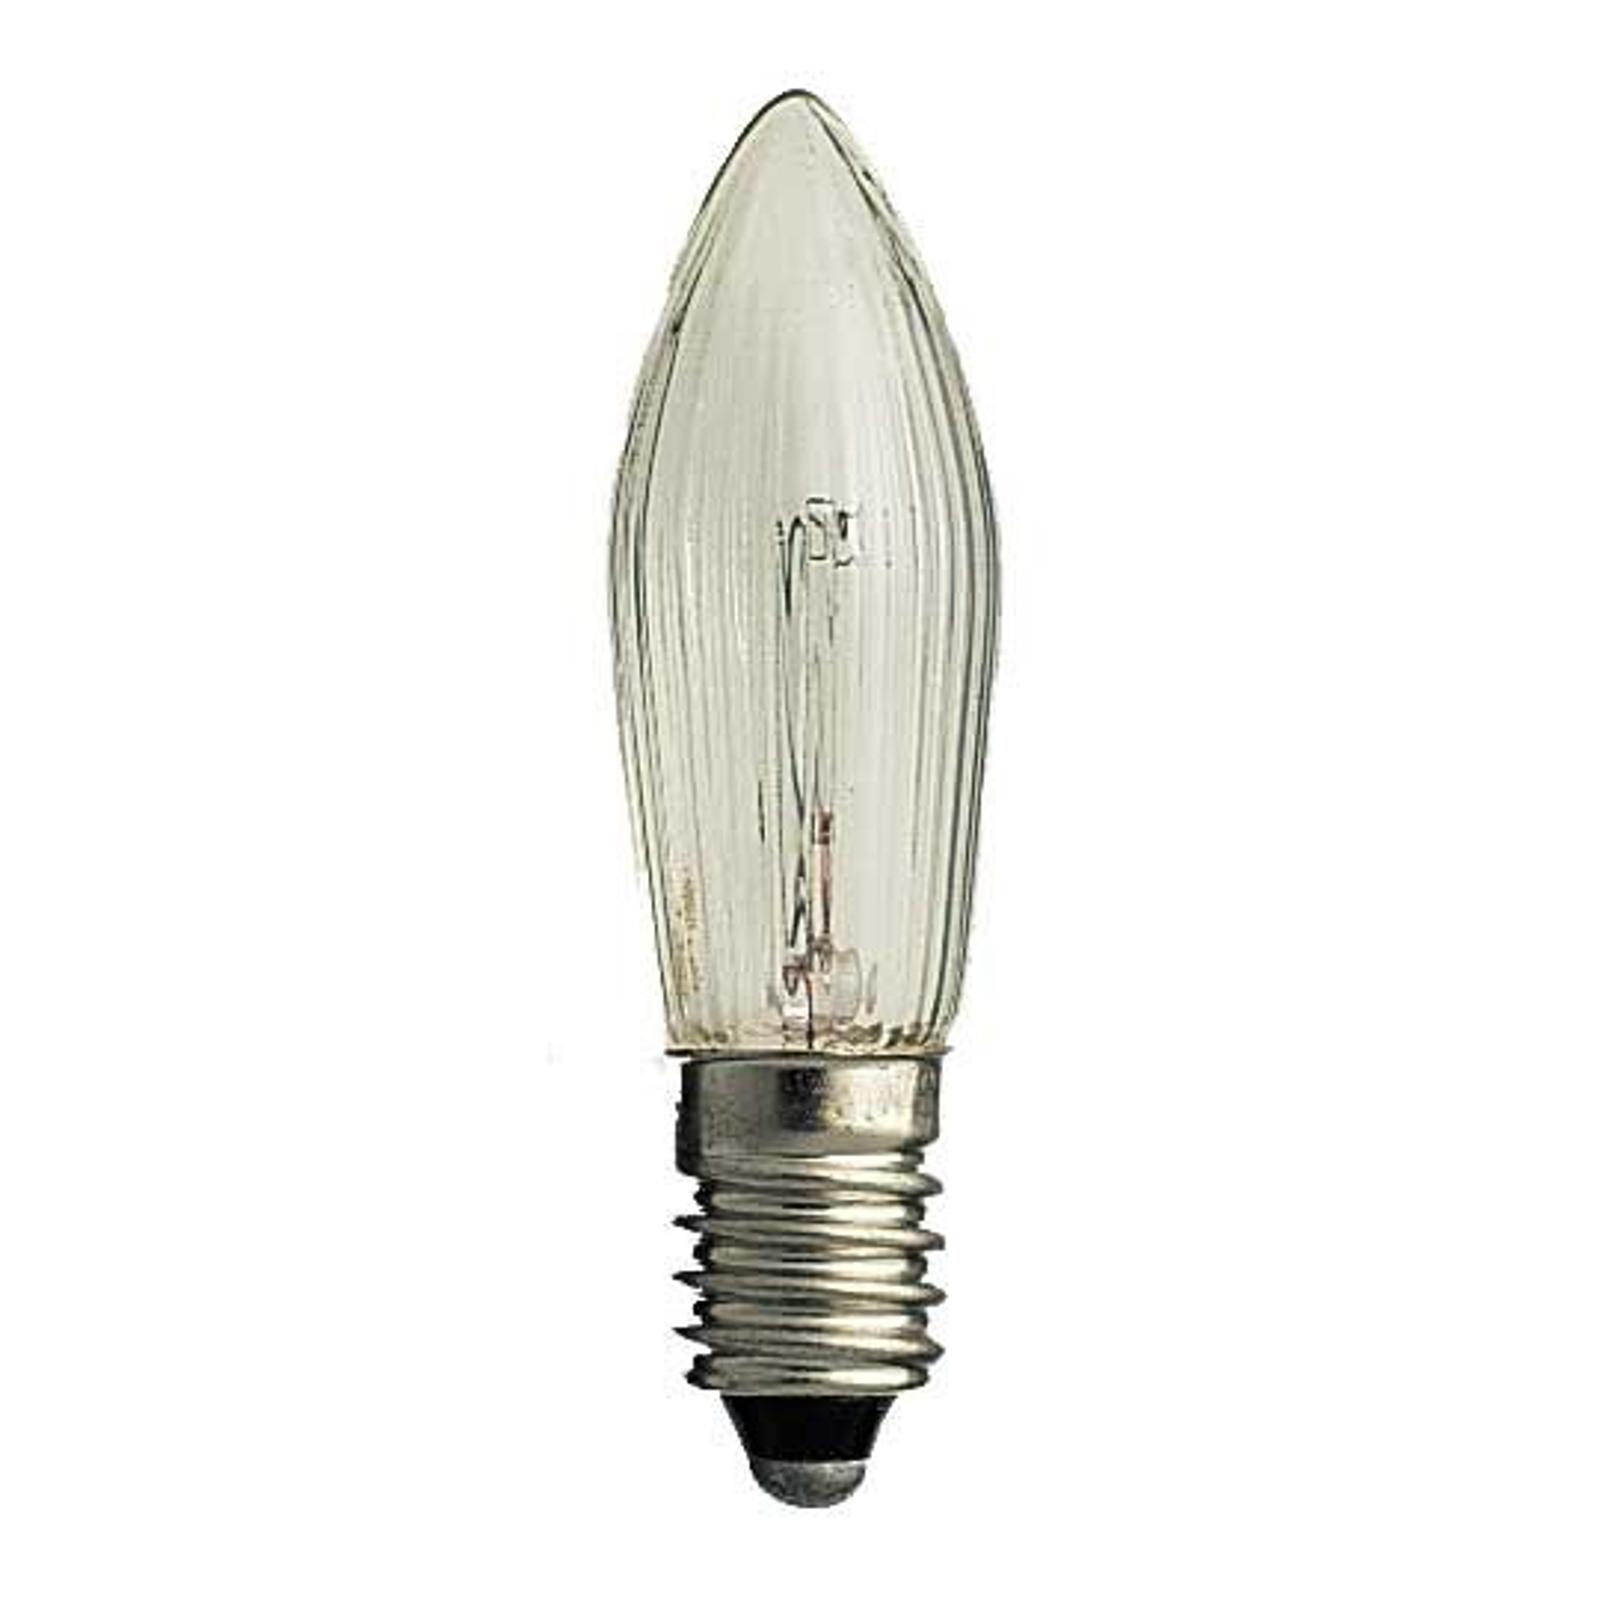 E10 3W 55V -varalamppu, kynttilä, 3 kpl/pakkaus